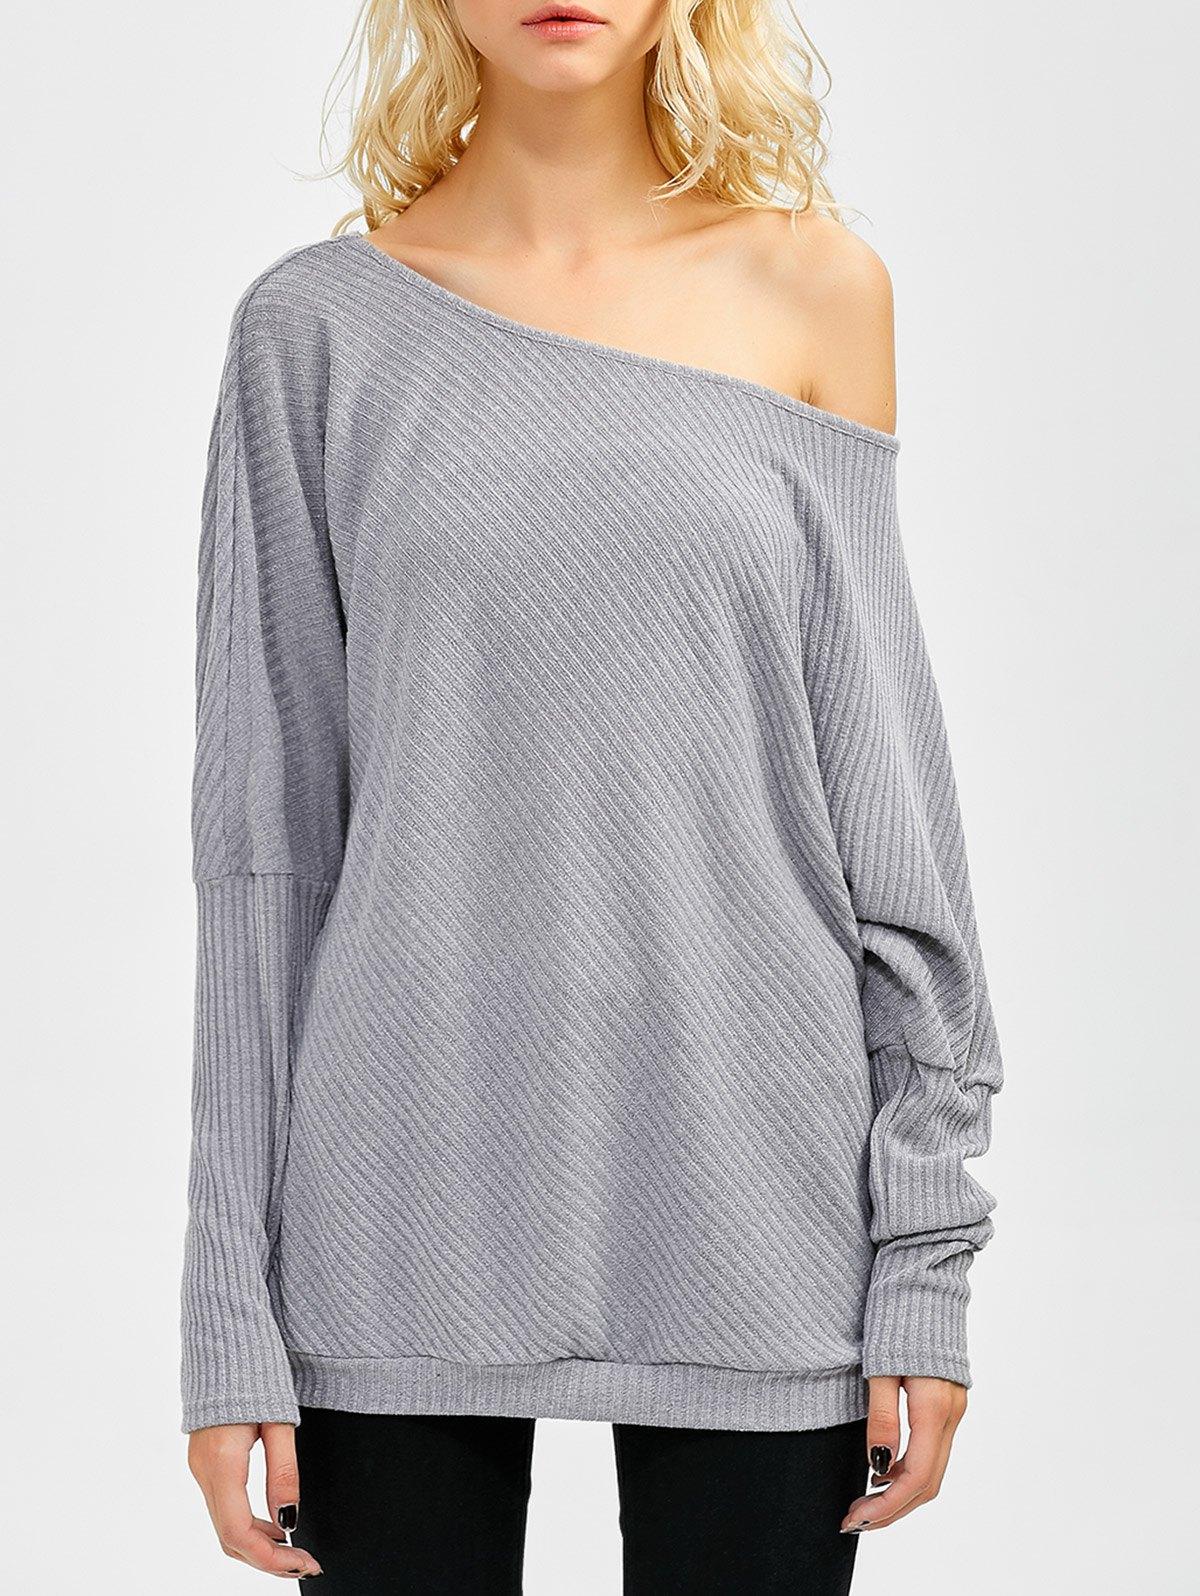 Bare Shoulder Batwing Sweater